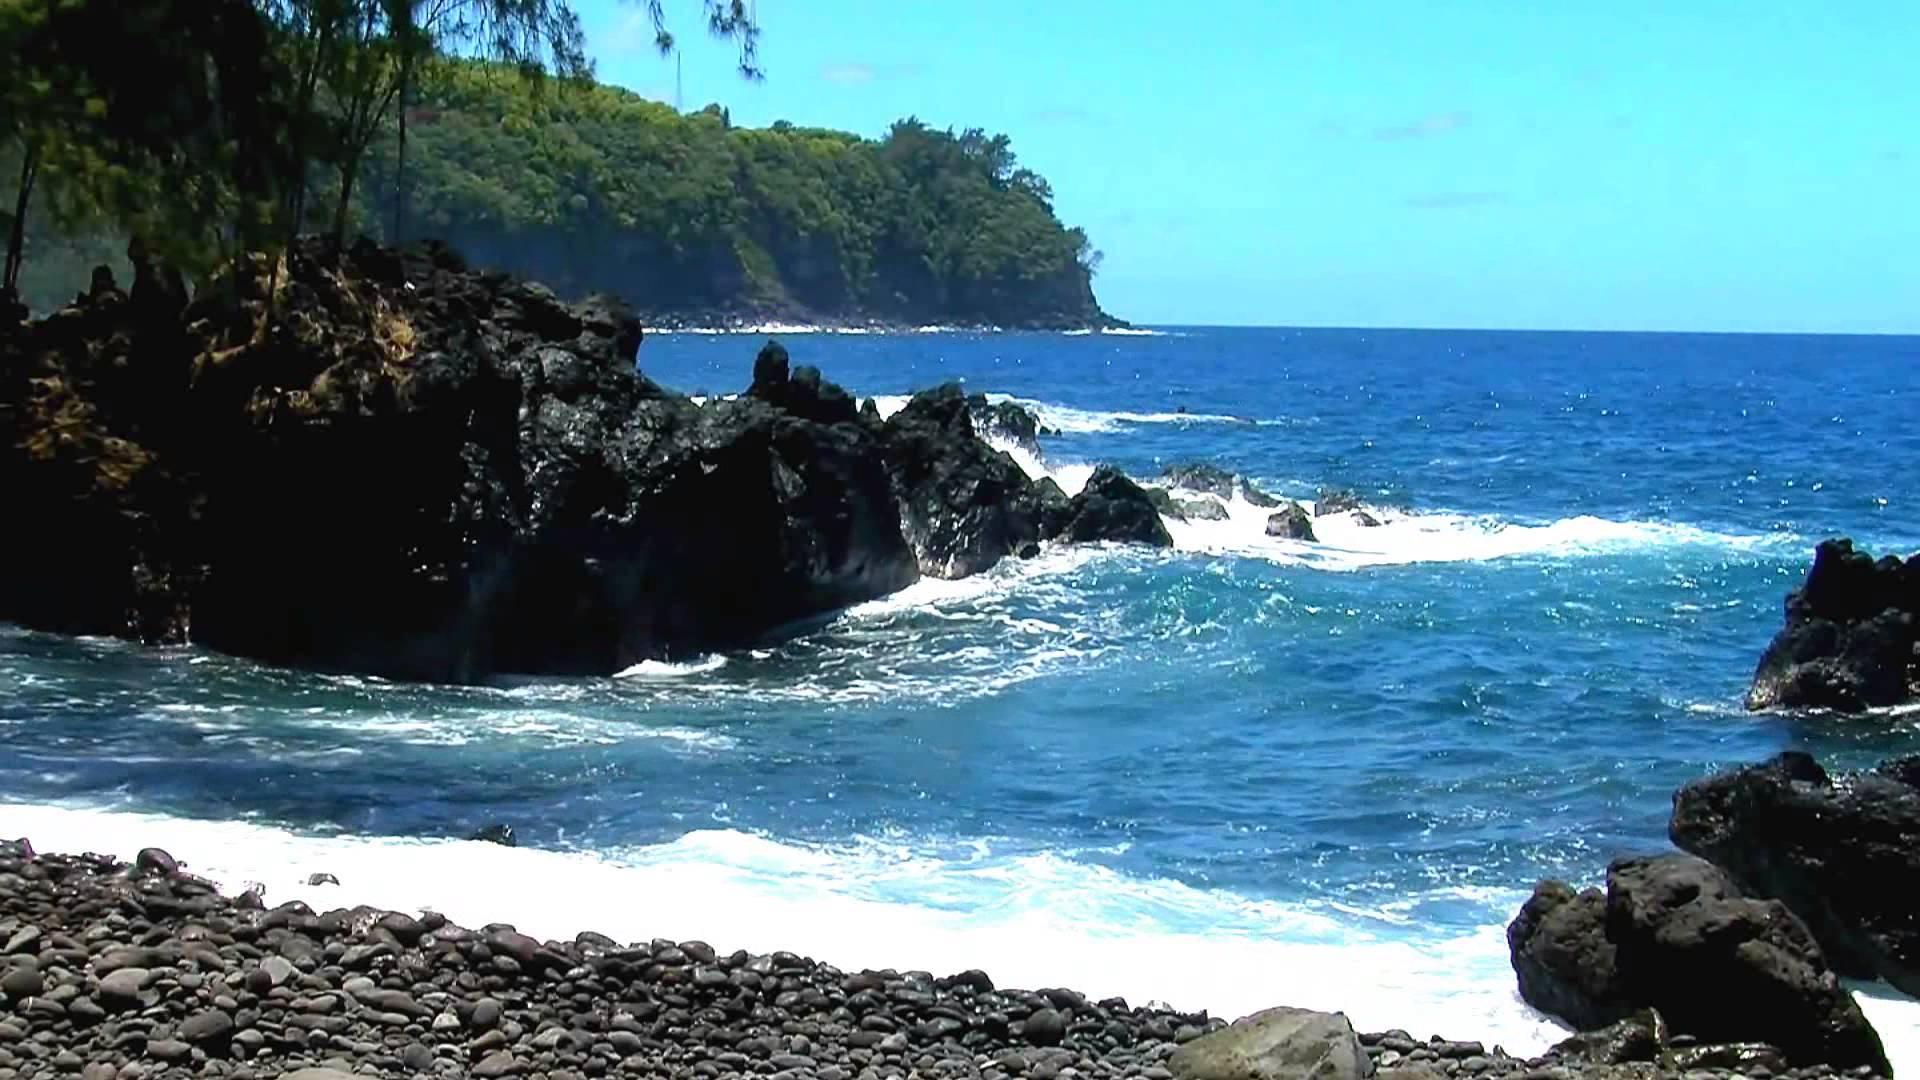 Laupāhoehoe Point Park - North Hilo, Hawaii